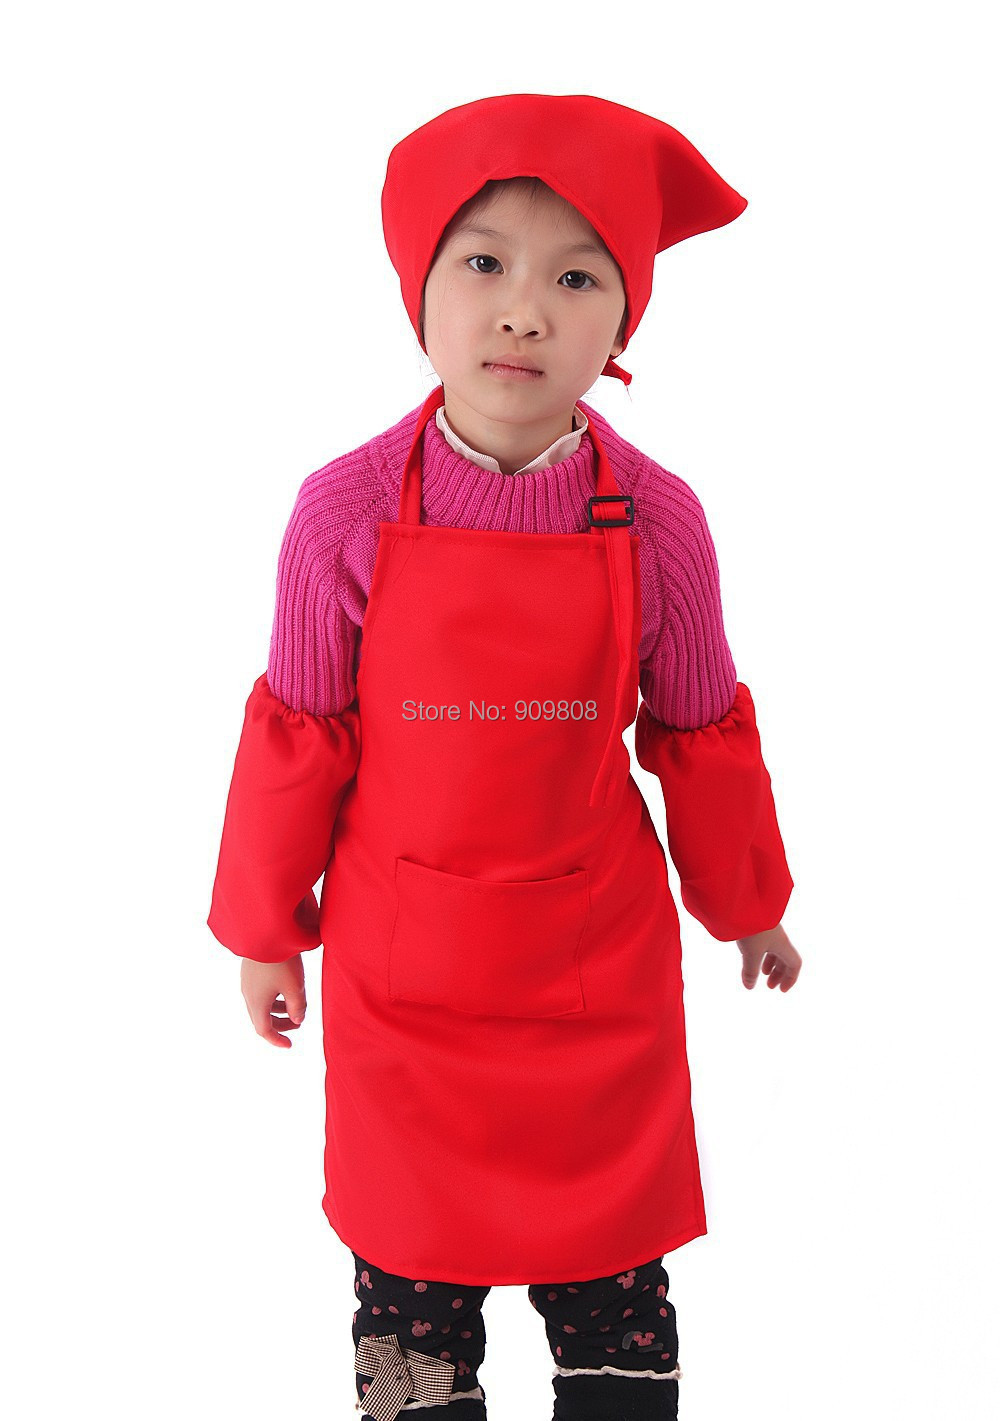 free shipping 120pcs/lot custom children apron(China (Mainland))